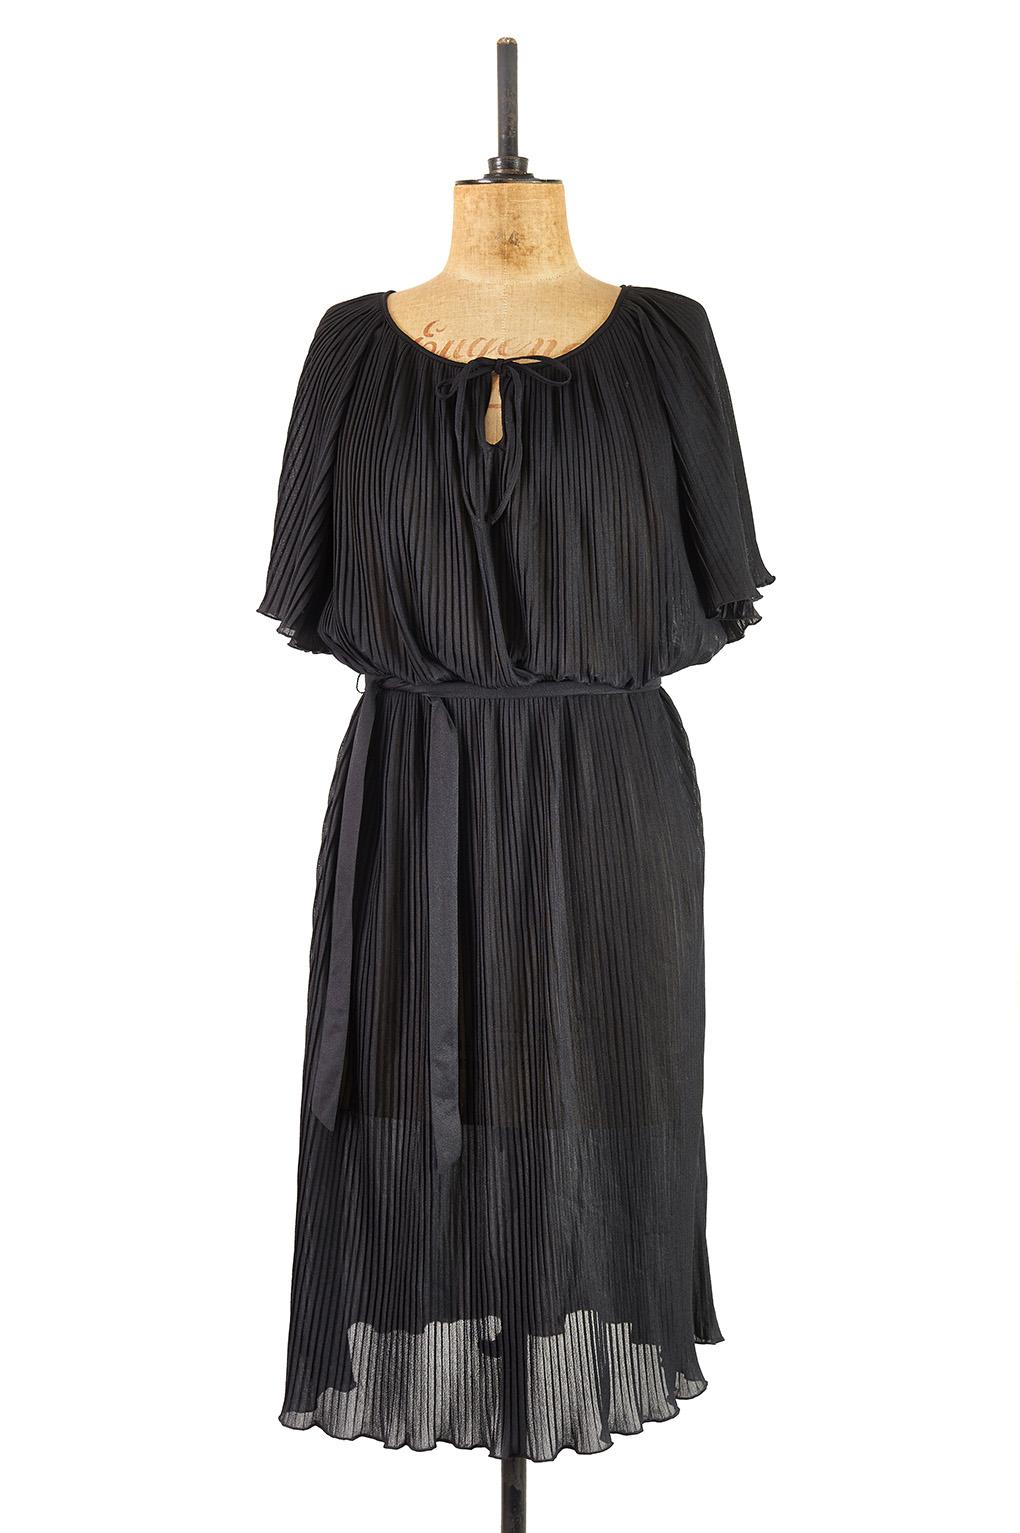 Jet Black Batwing Dress